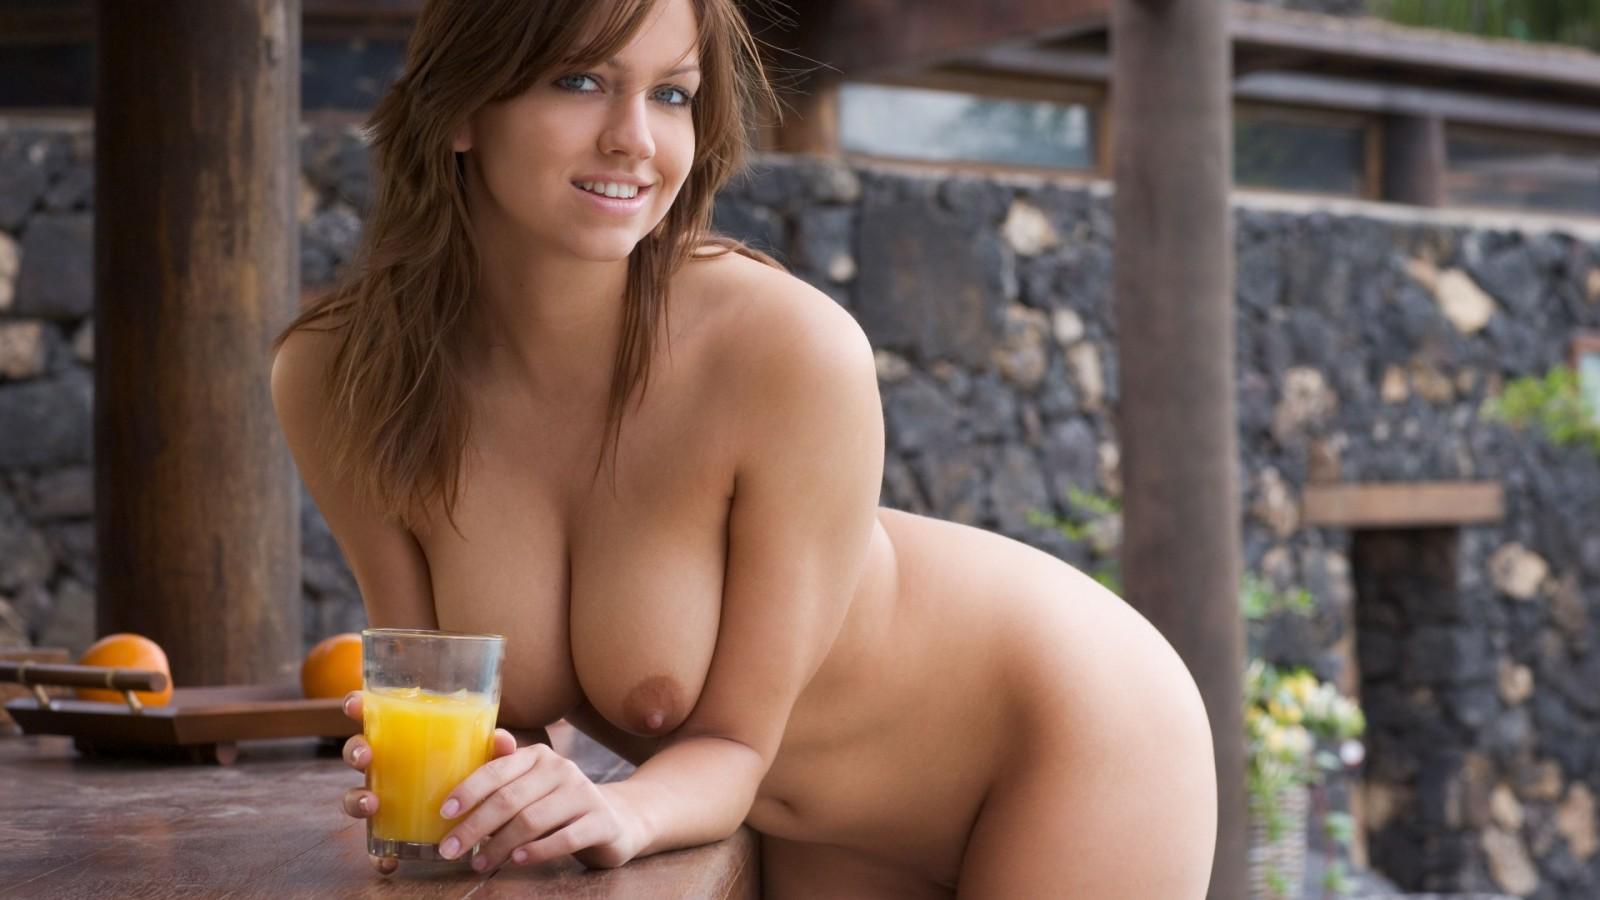 lesbiyanka-dominiruet-onlayn-porno